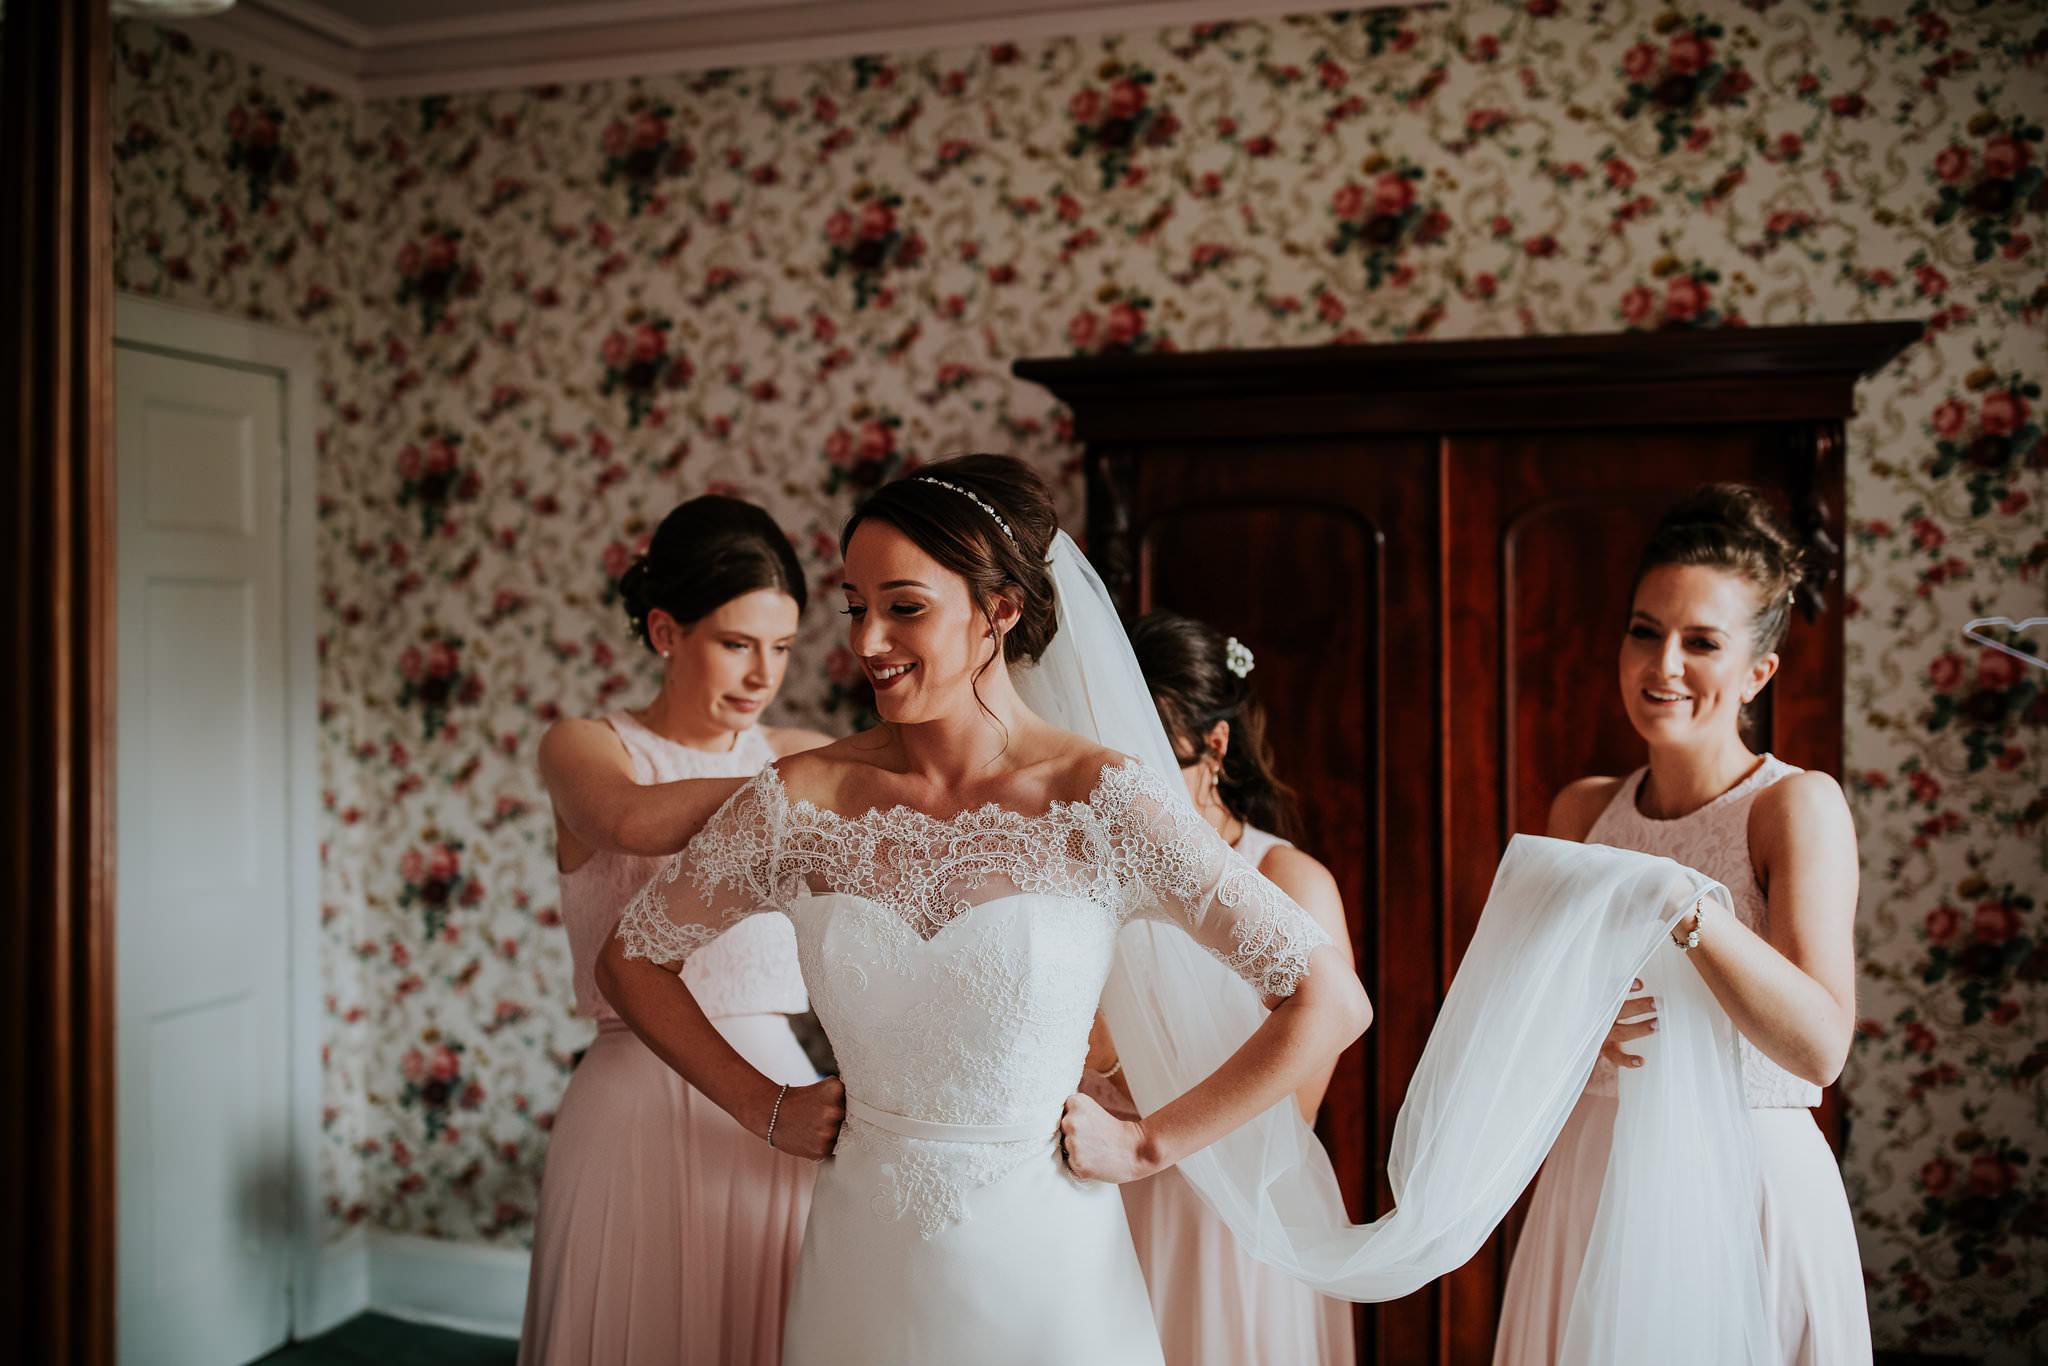 kirknewton stables wedding photographer (13).jpg